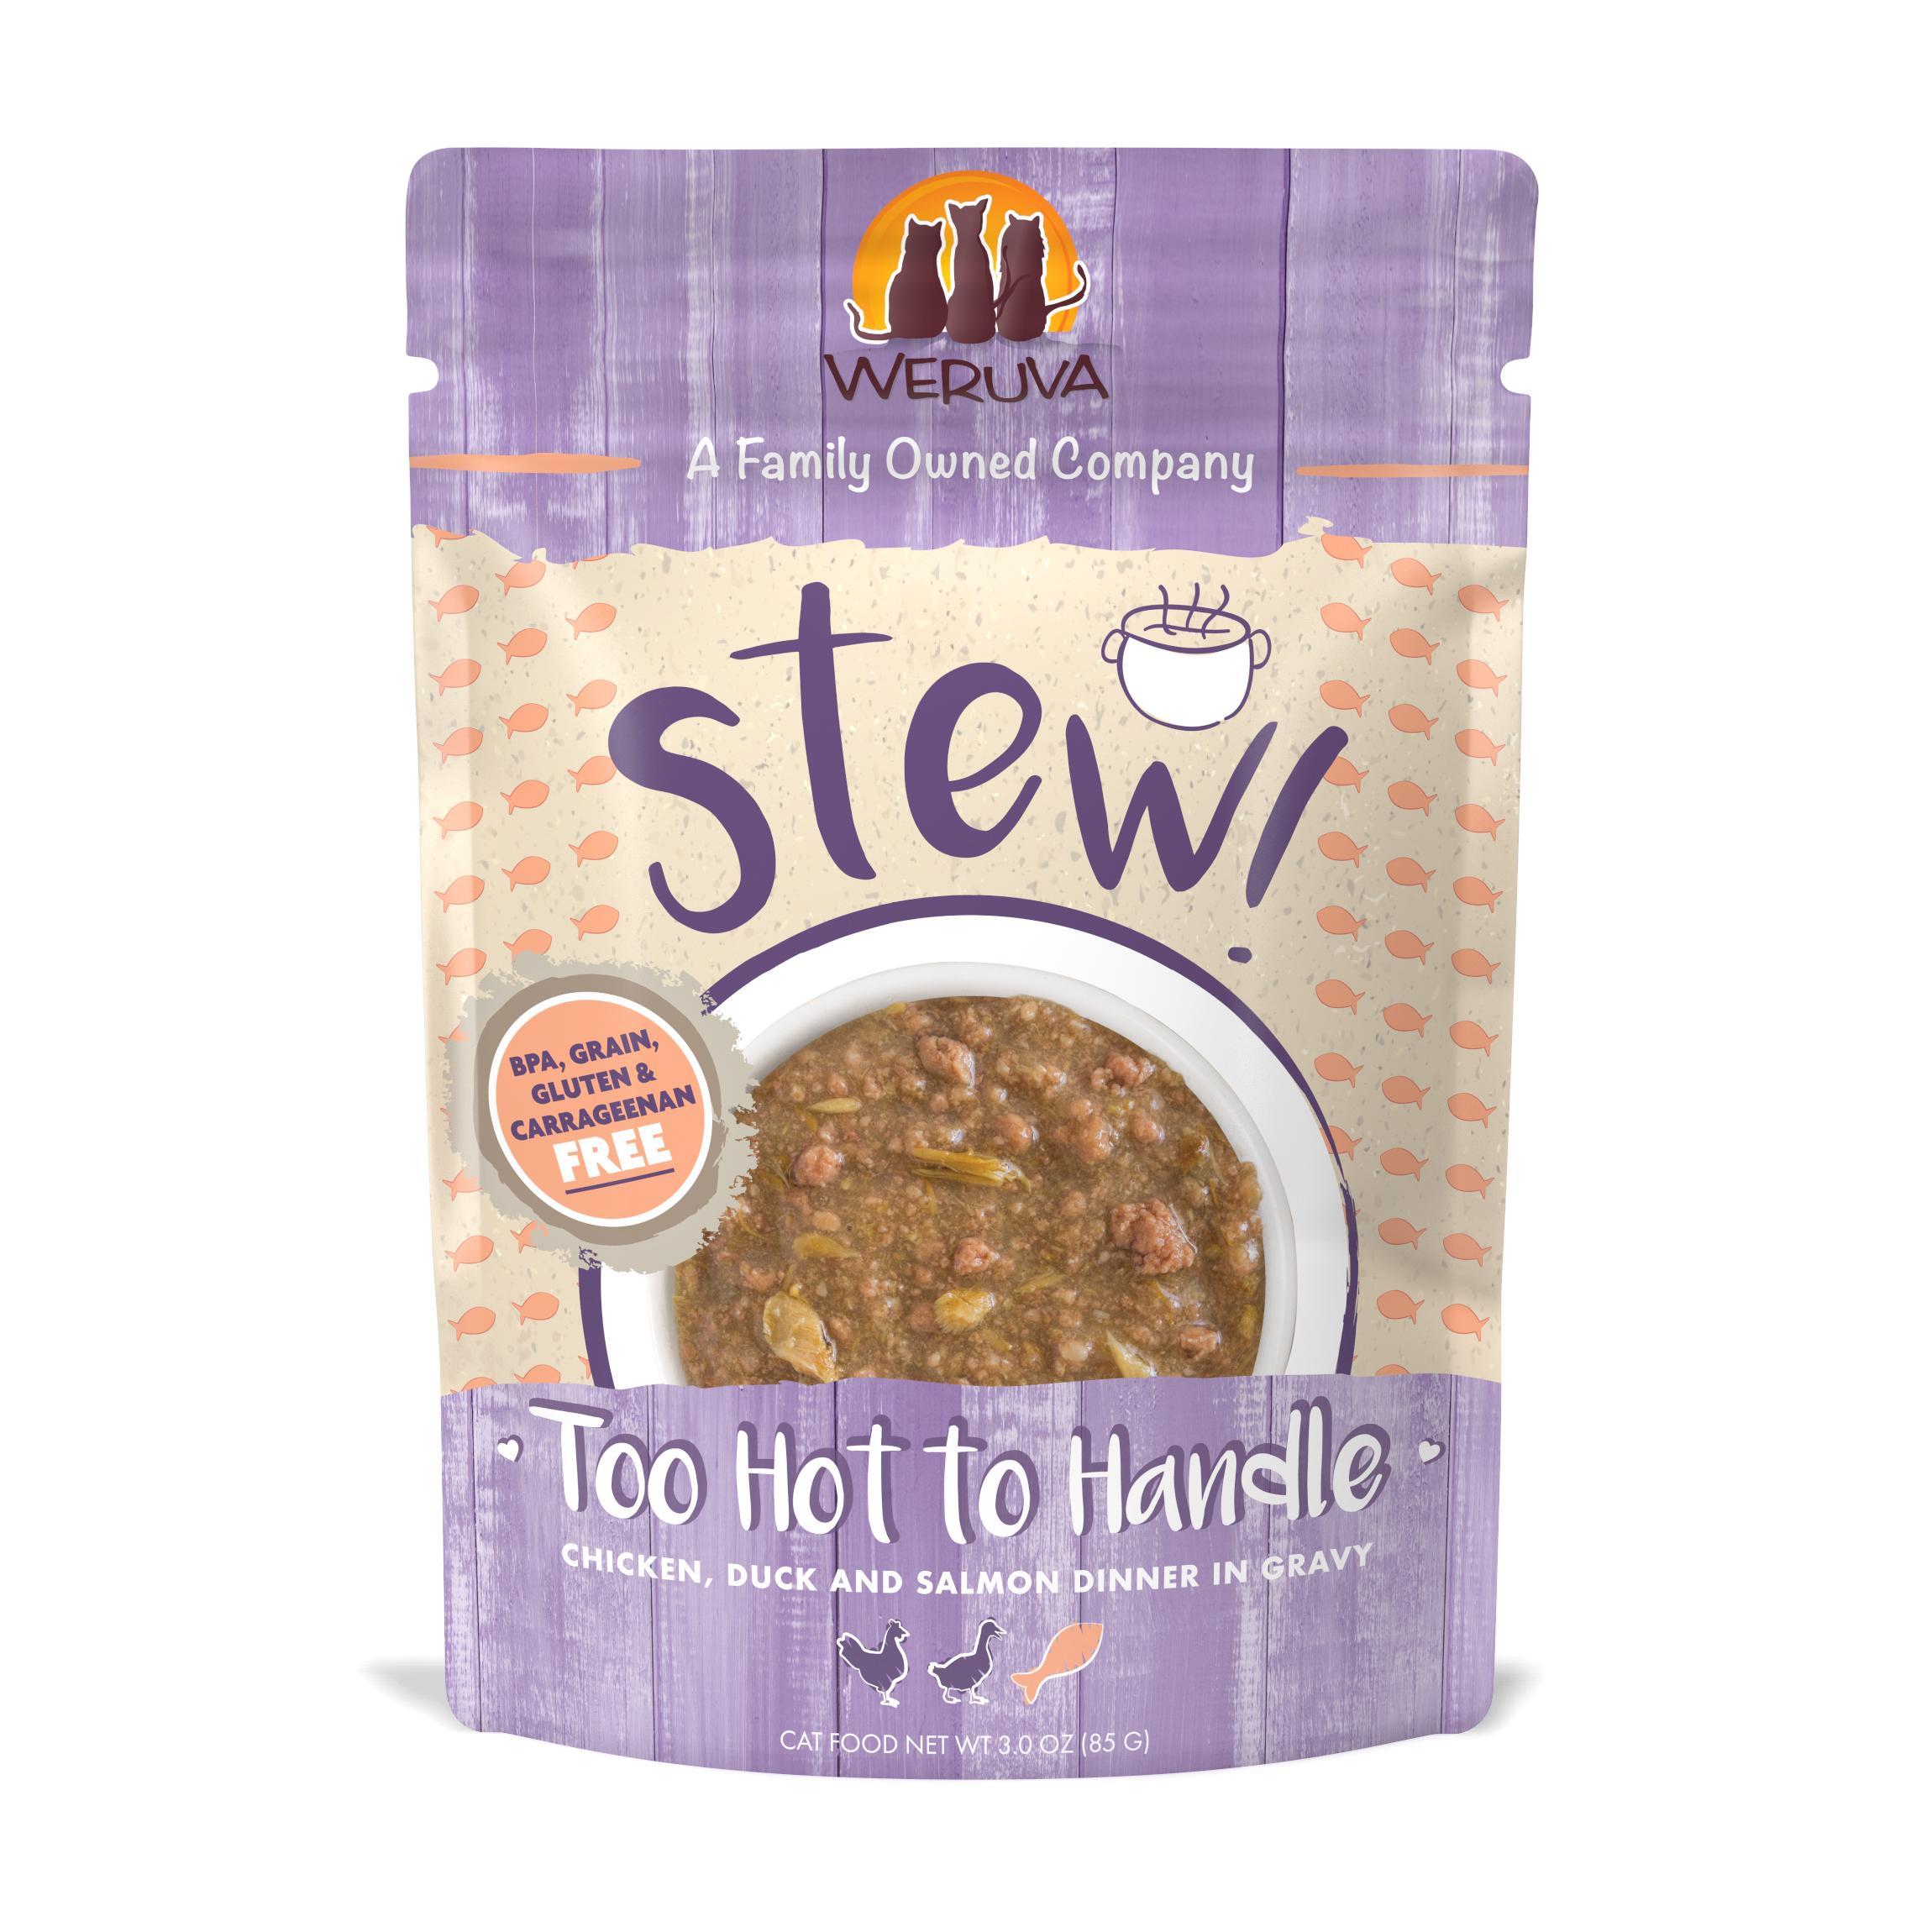 Weruva Cat Stew! Too Hot to Handle Chicken, Duck & Salmon Dinner in Gravy Wet Cat Food, 3-oz